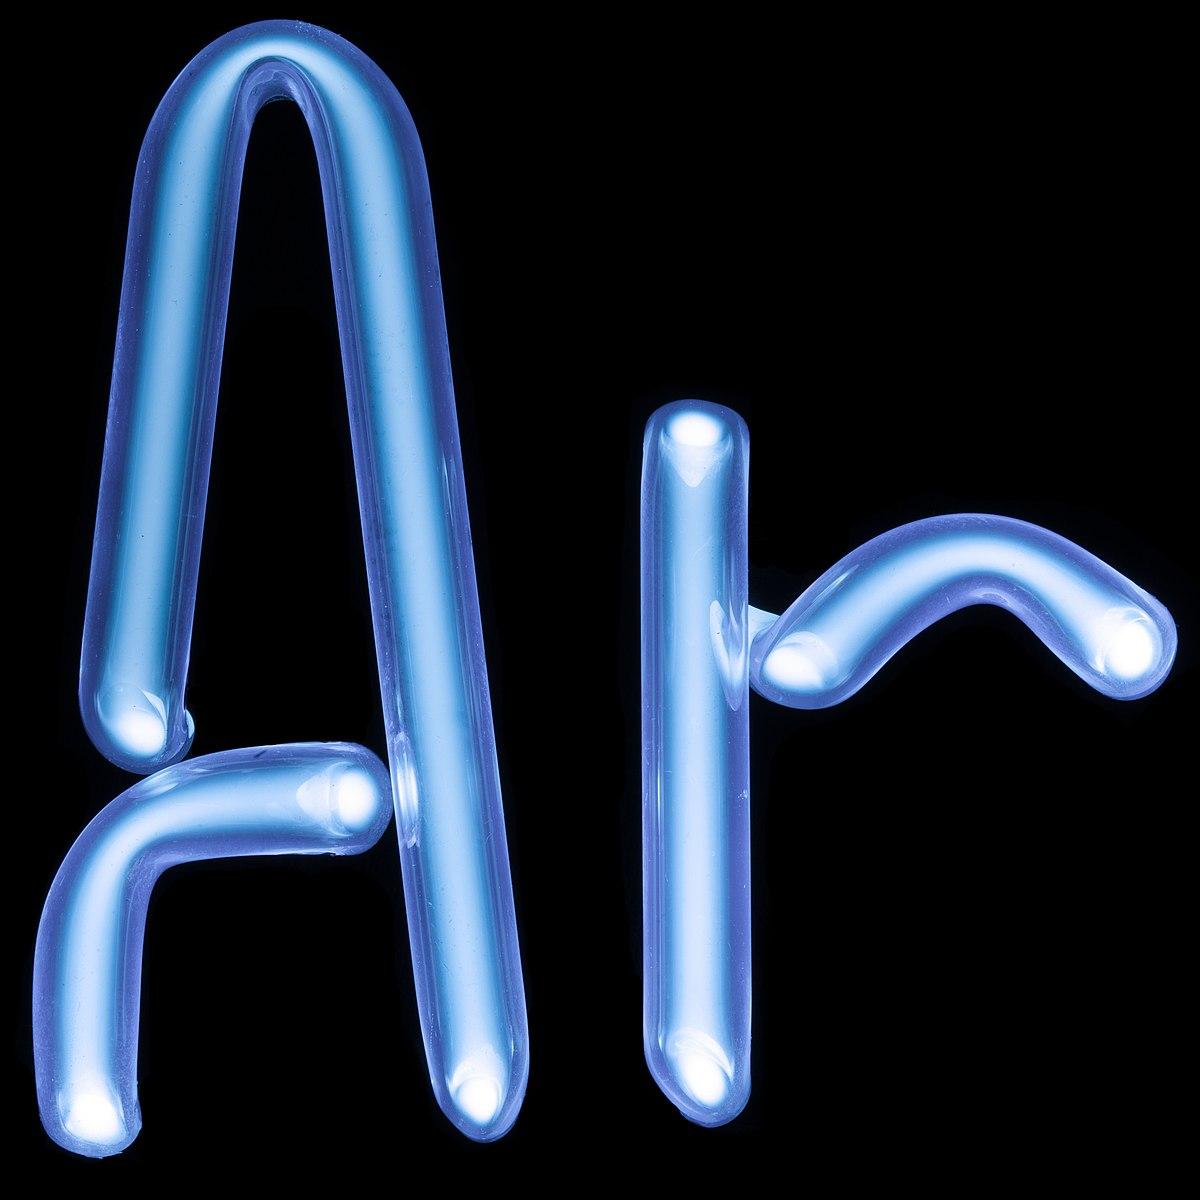 electric blue color wikipedia. Black Bedroom Furniture Sets. Home Design Ideas